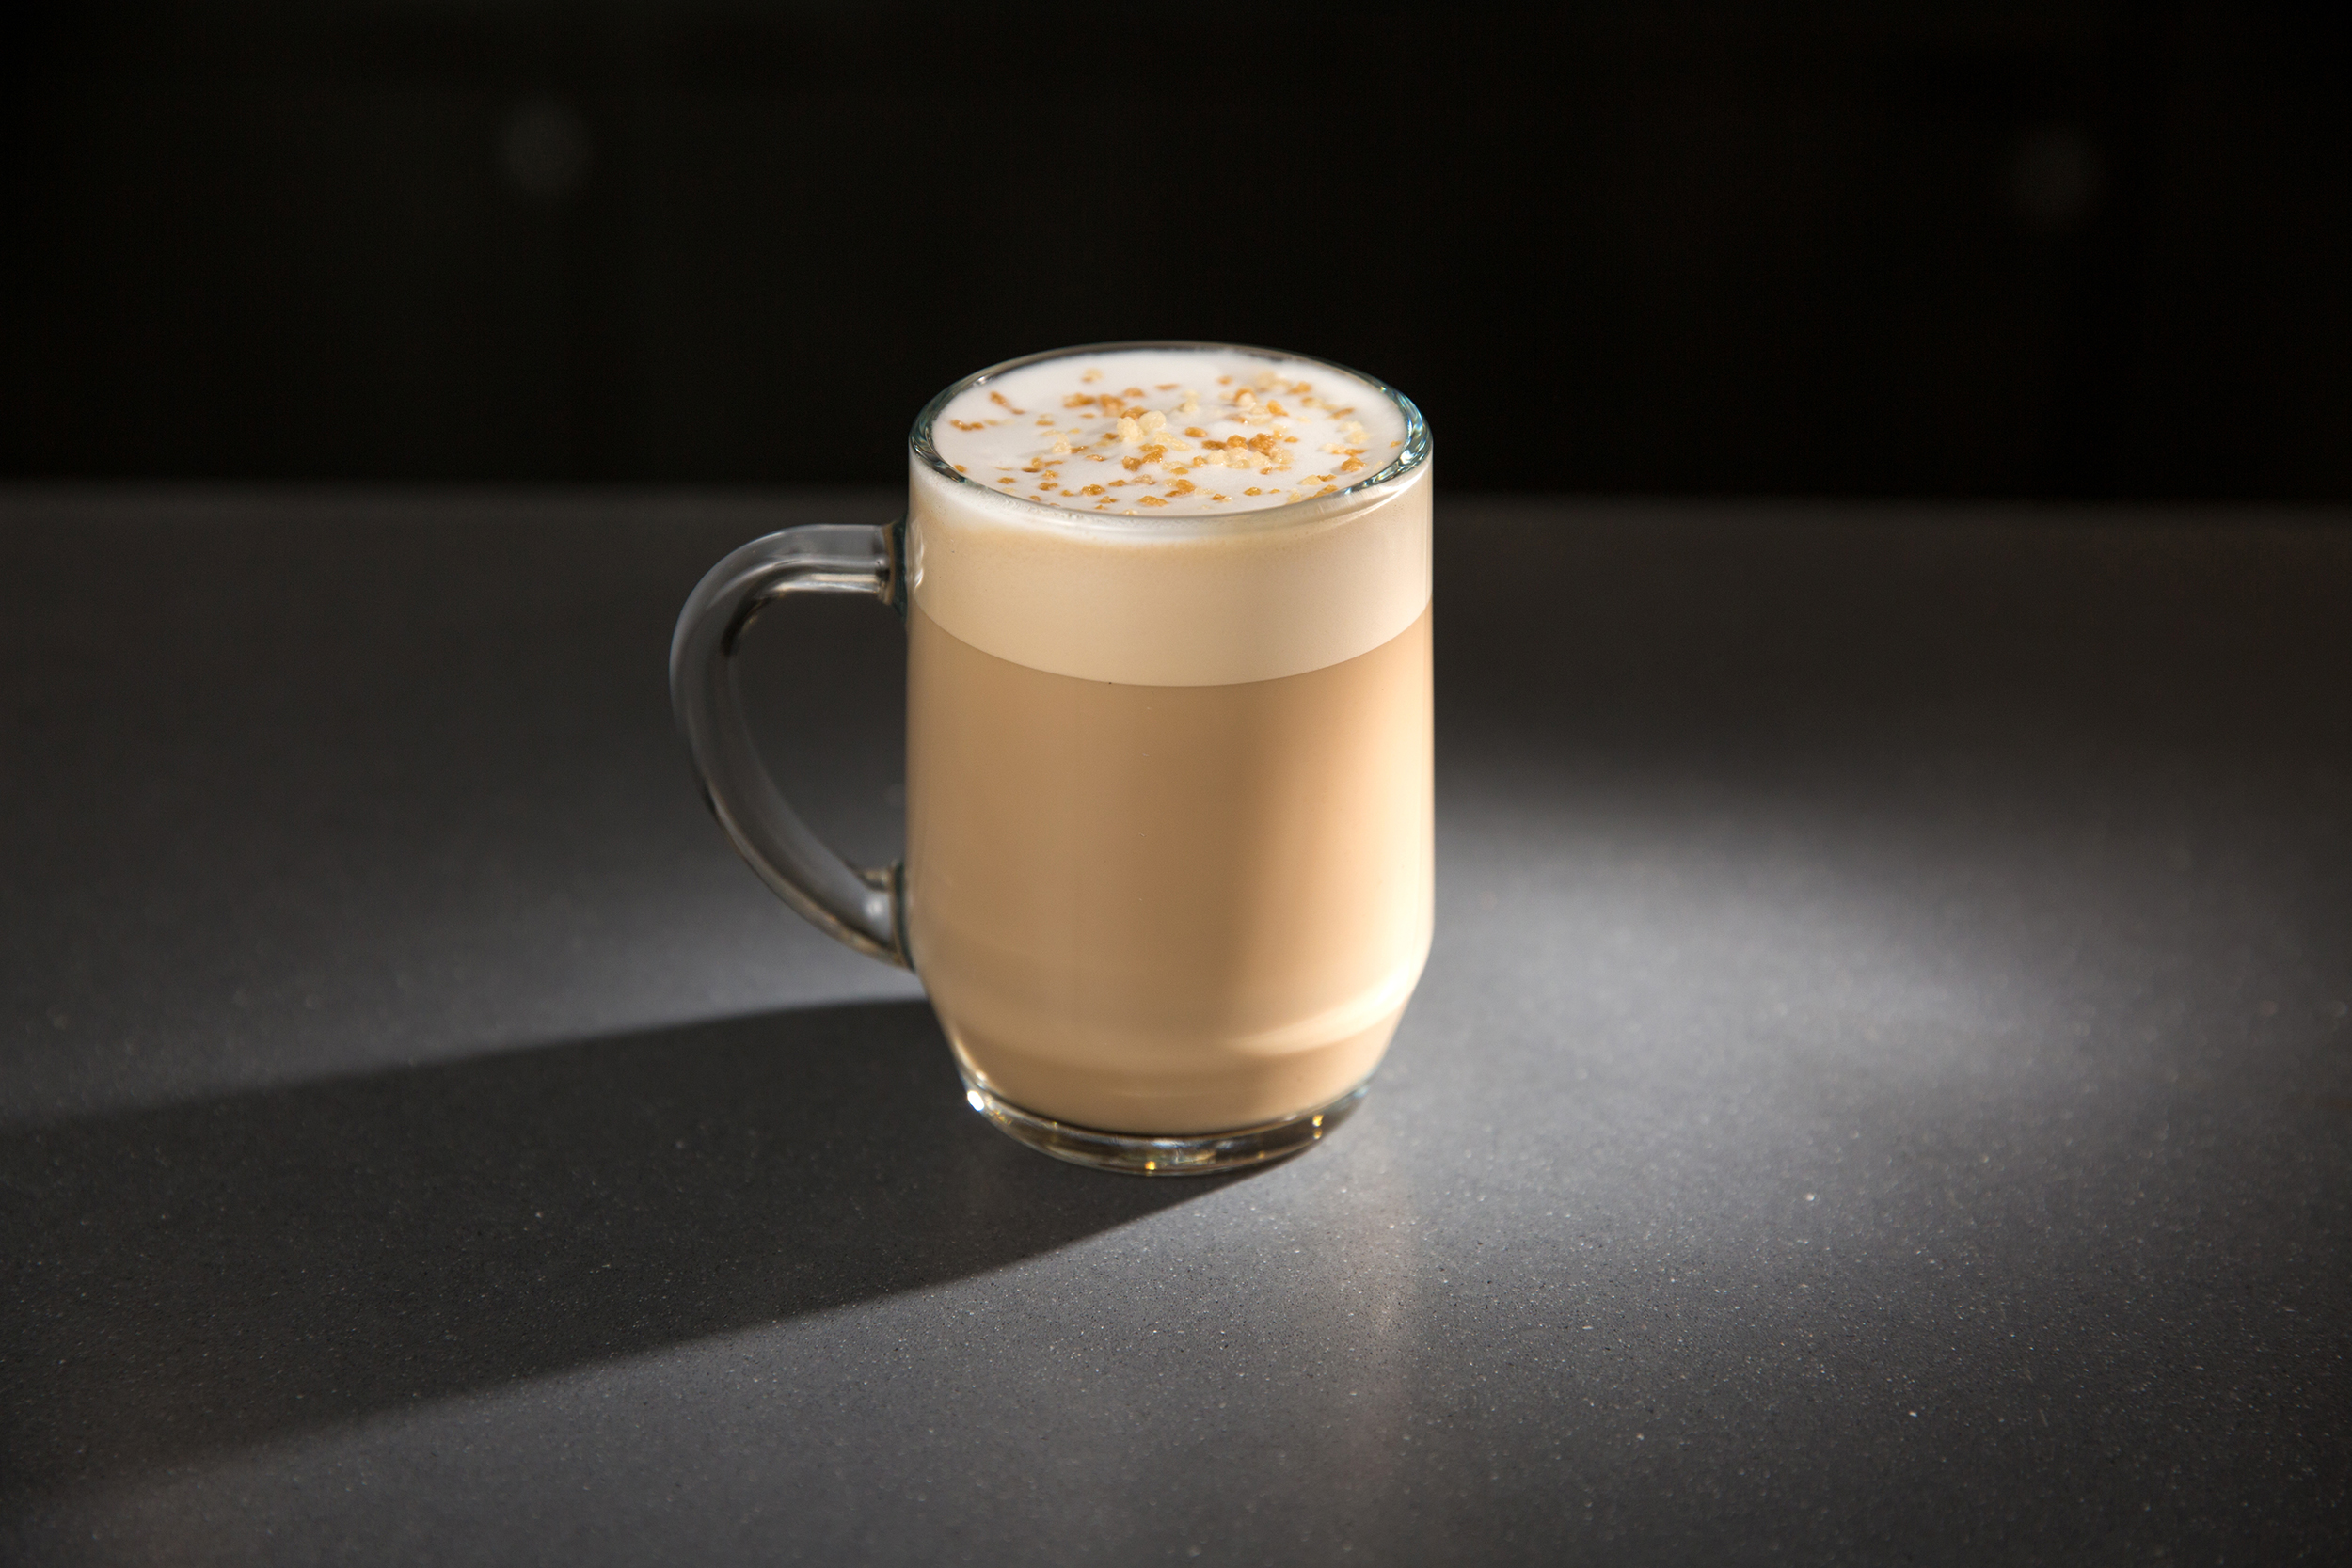 Starbucks Caramelized Honey Latte photographed on March 17, 2016.